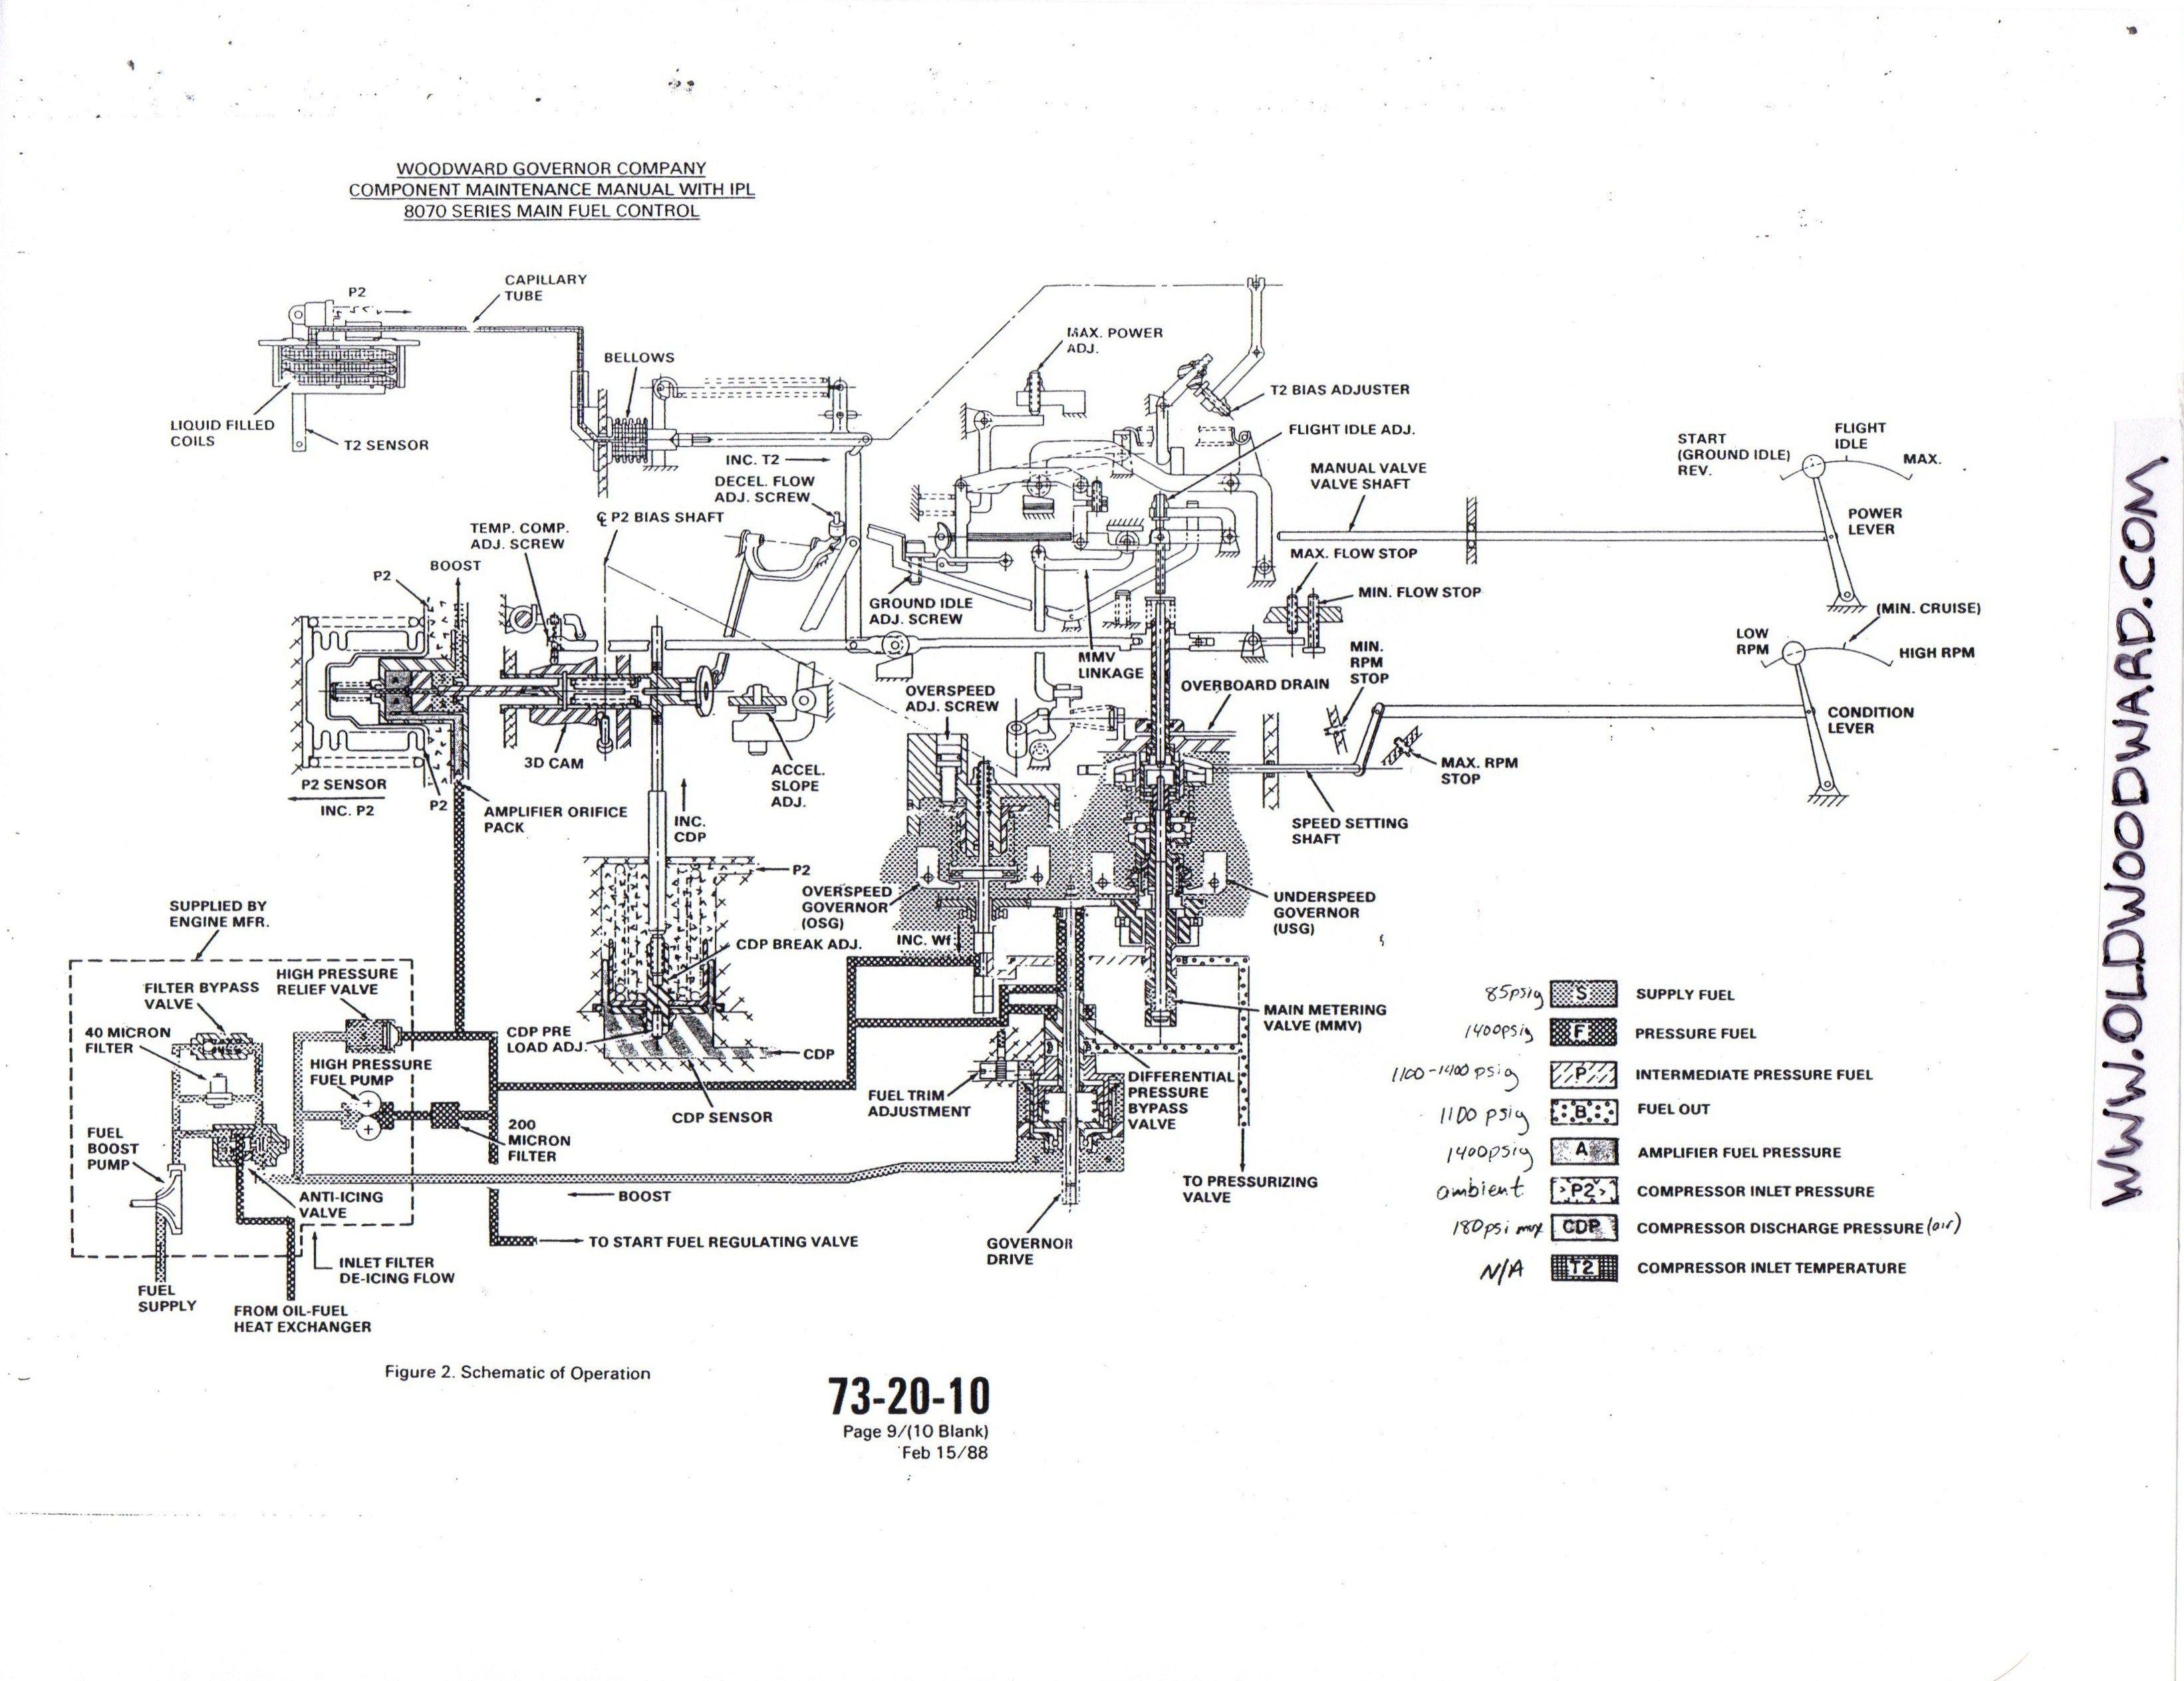 tf33 jet engine diagram gas turbine diagram wiring diagram